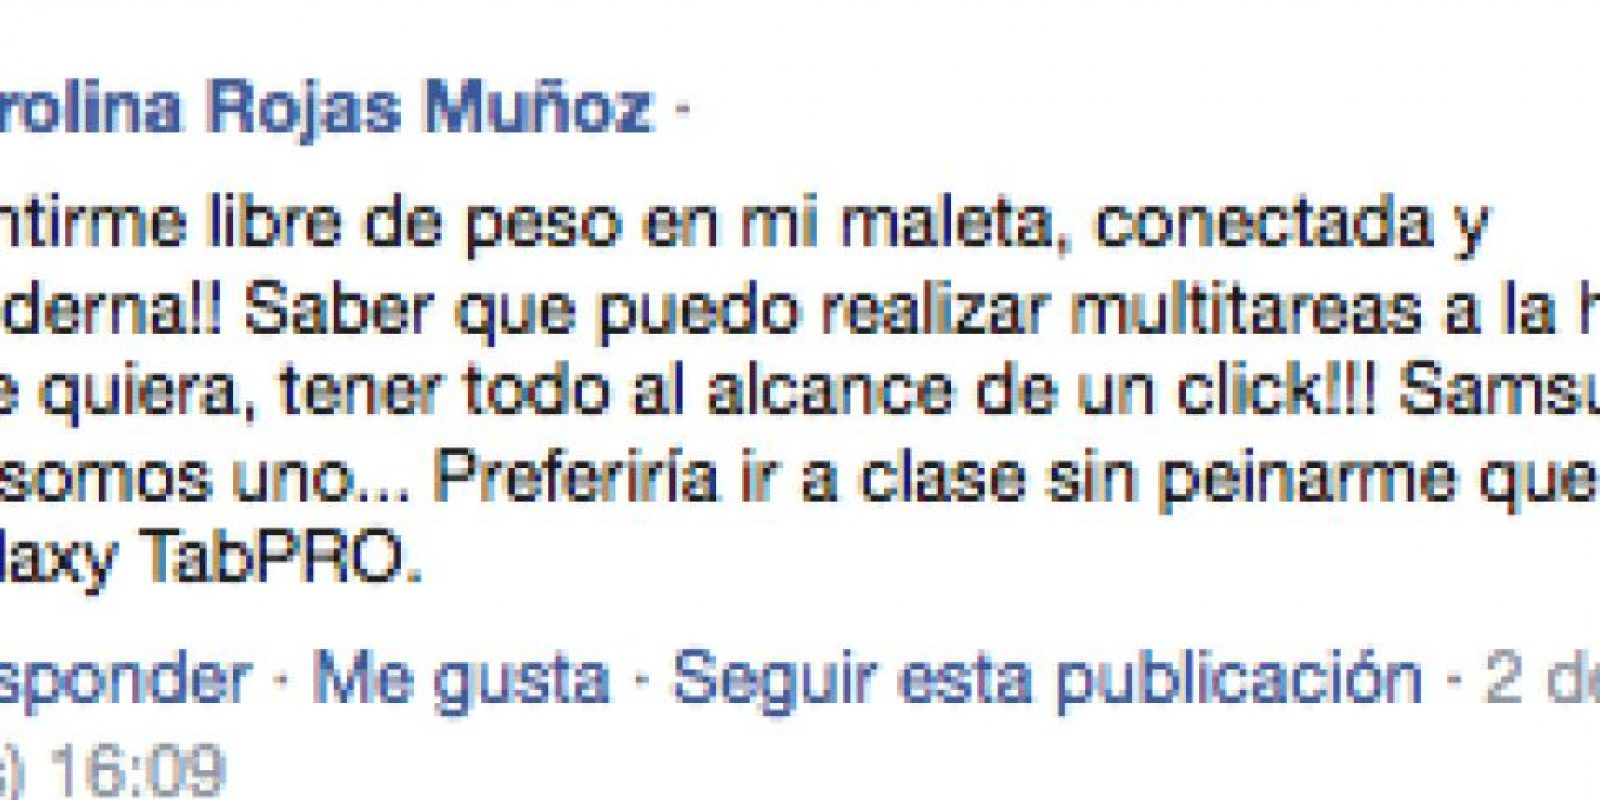 4) Carolina Rojas